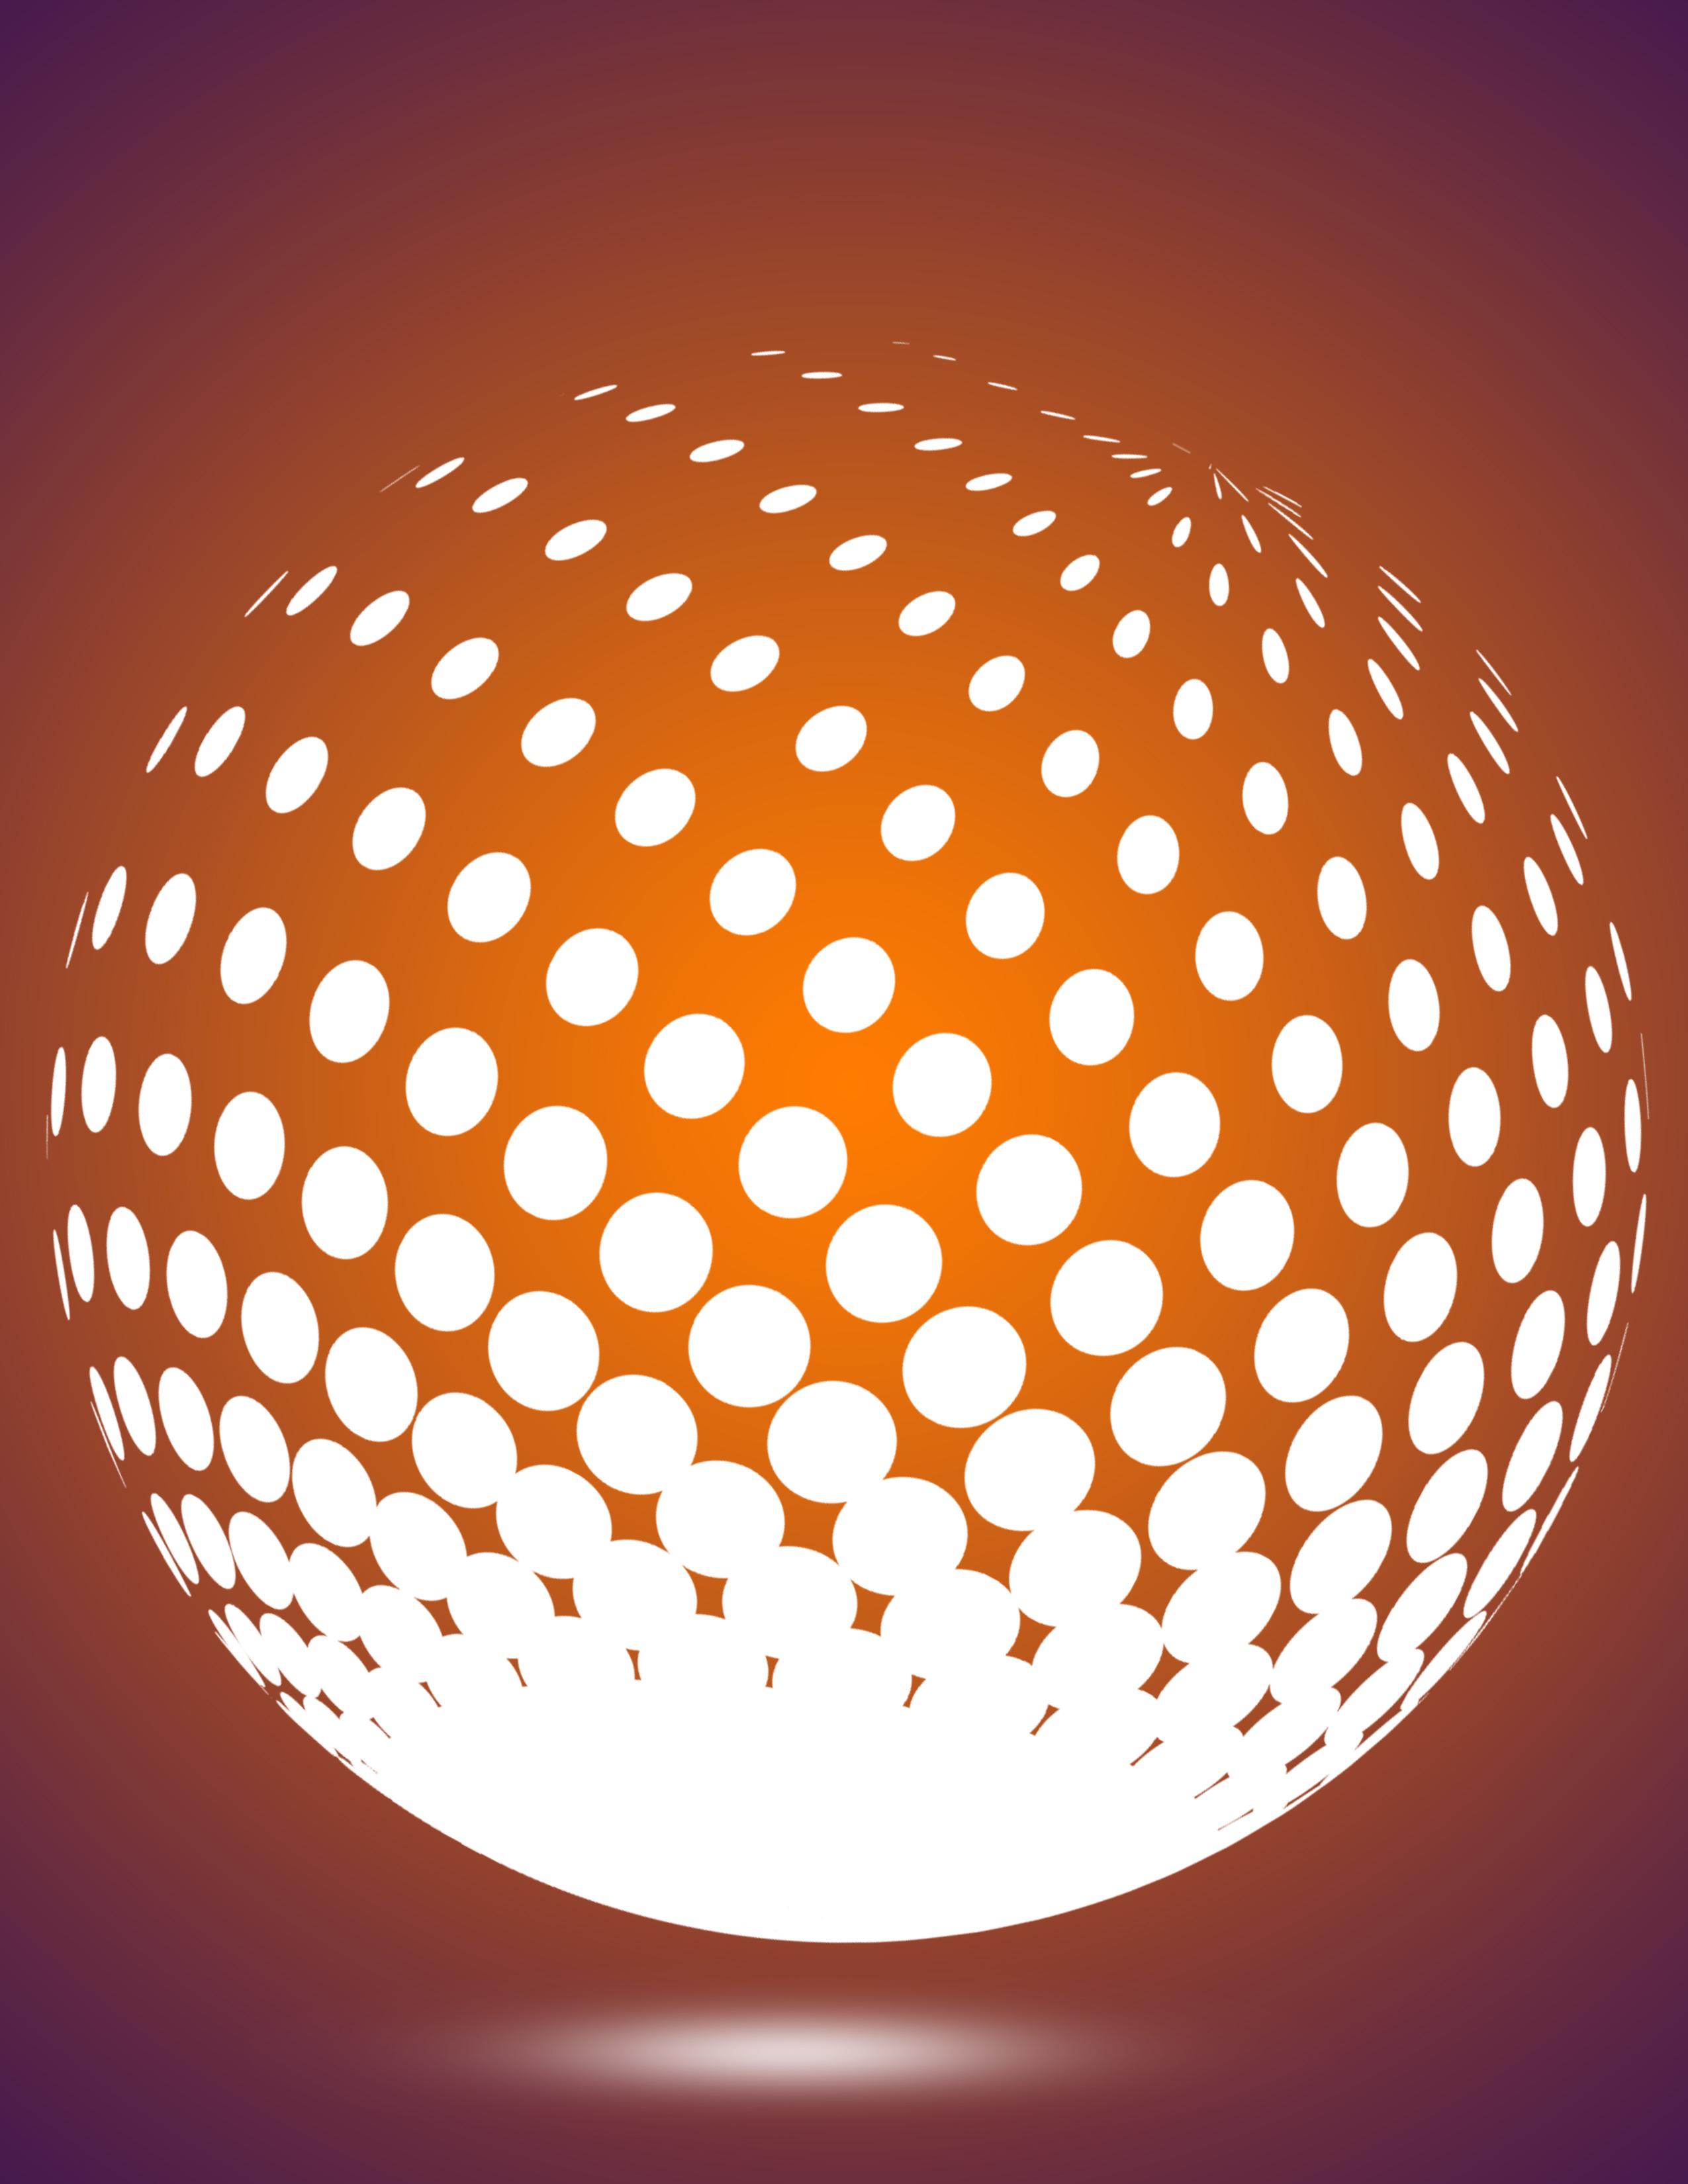 Dot Circle ball